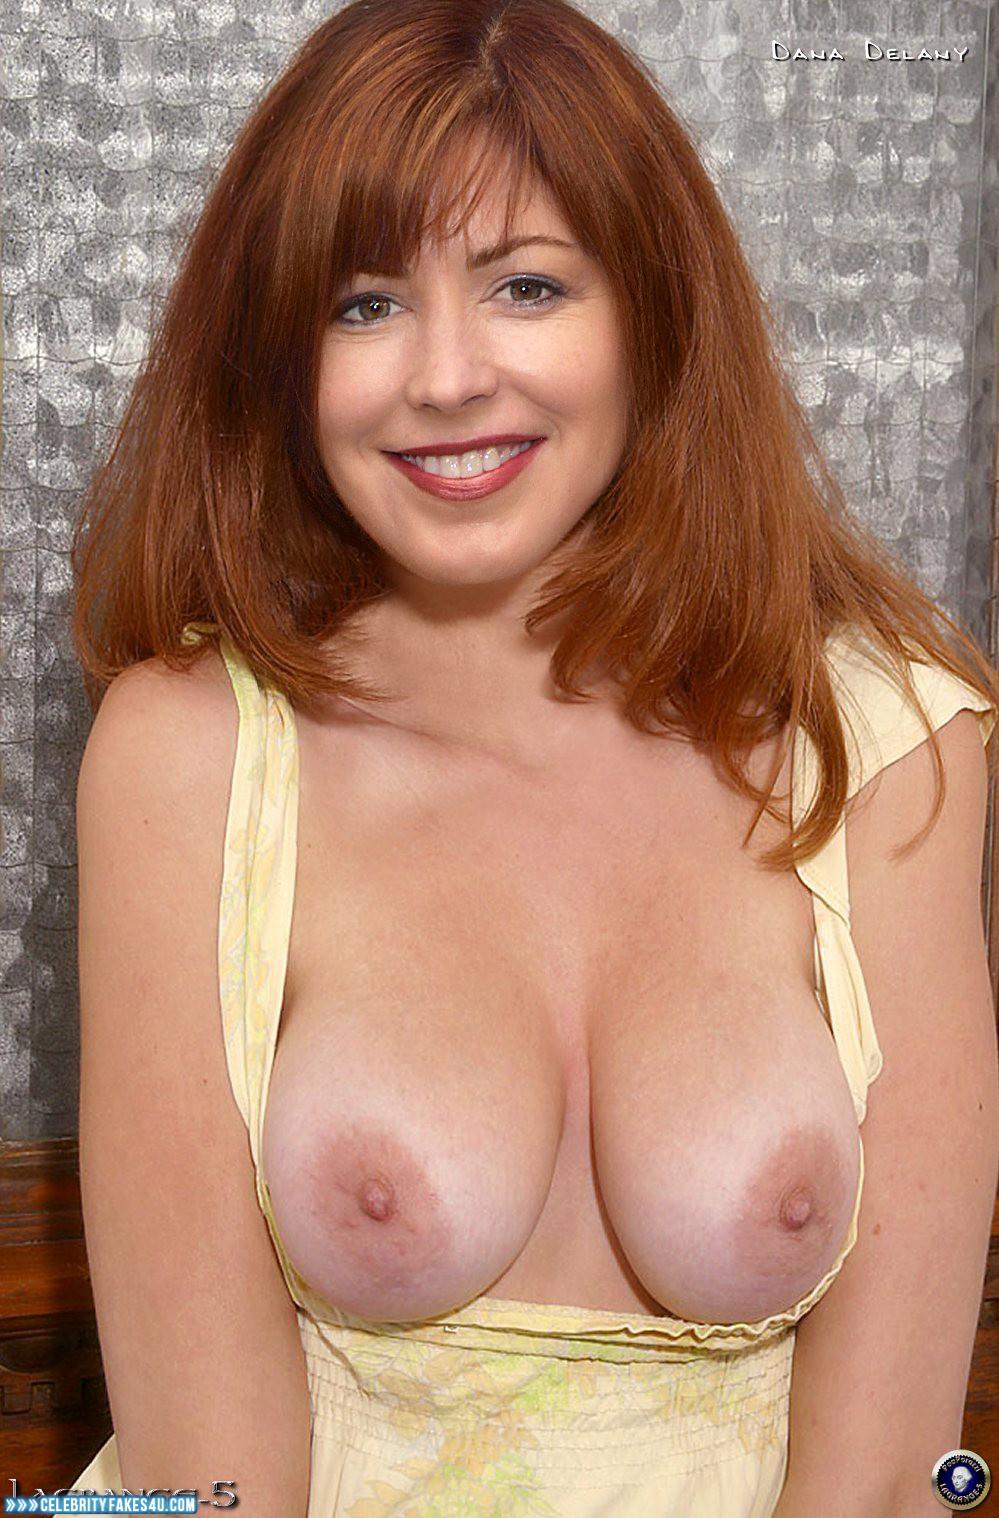 Dana Delany Nude Photos dana delany busty tit flash nude 001 « celebrity fakes 4u